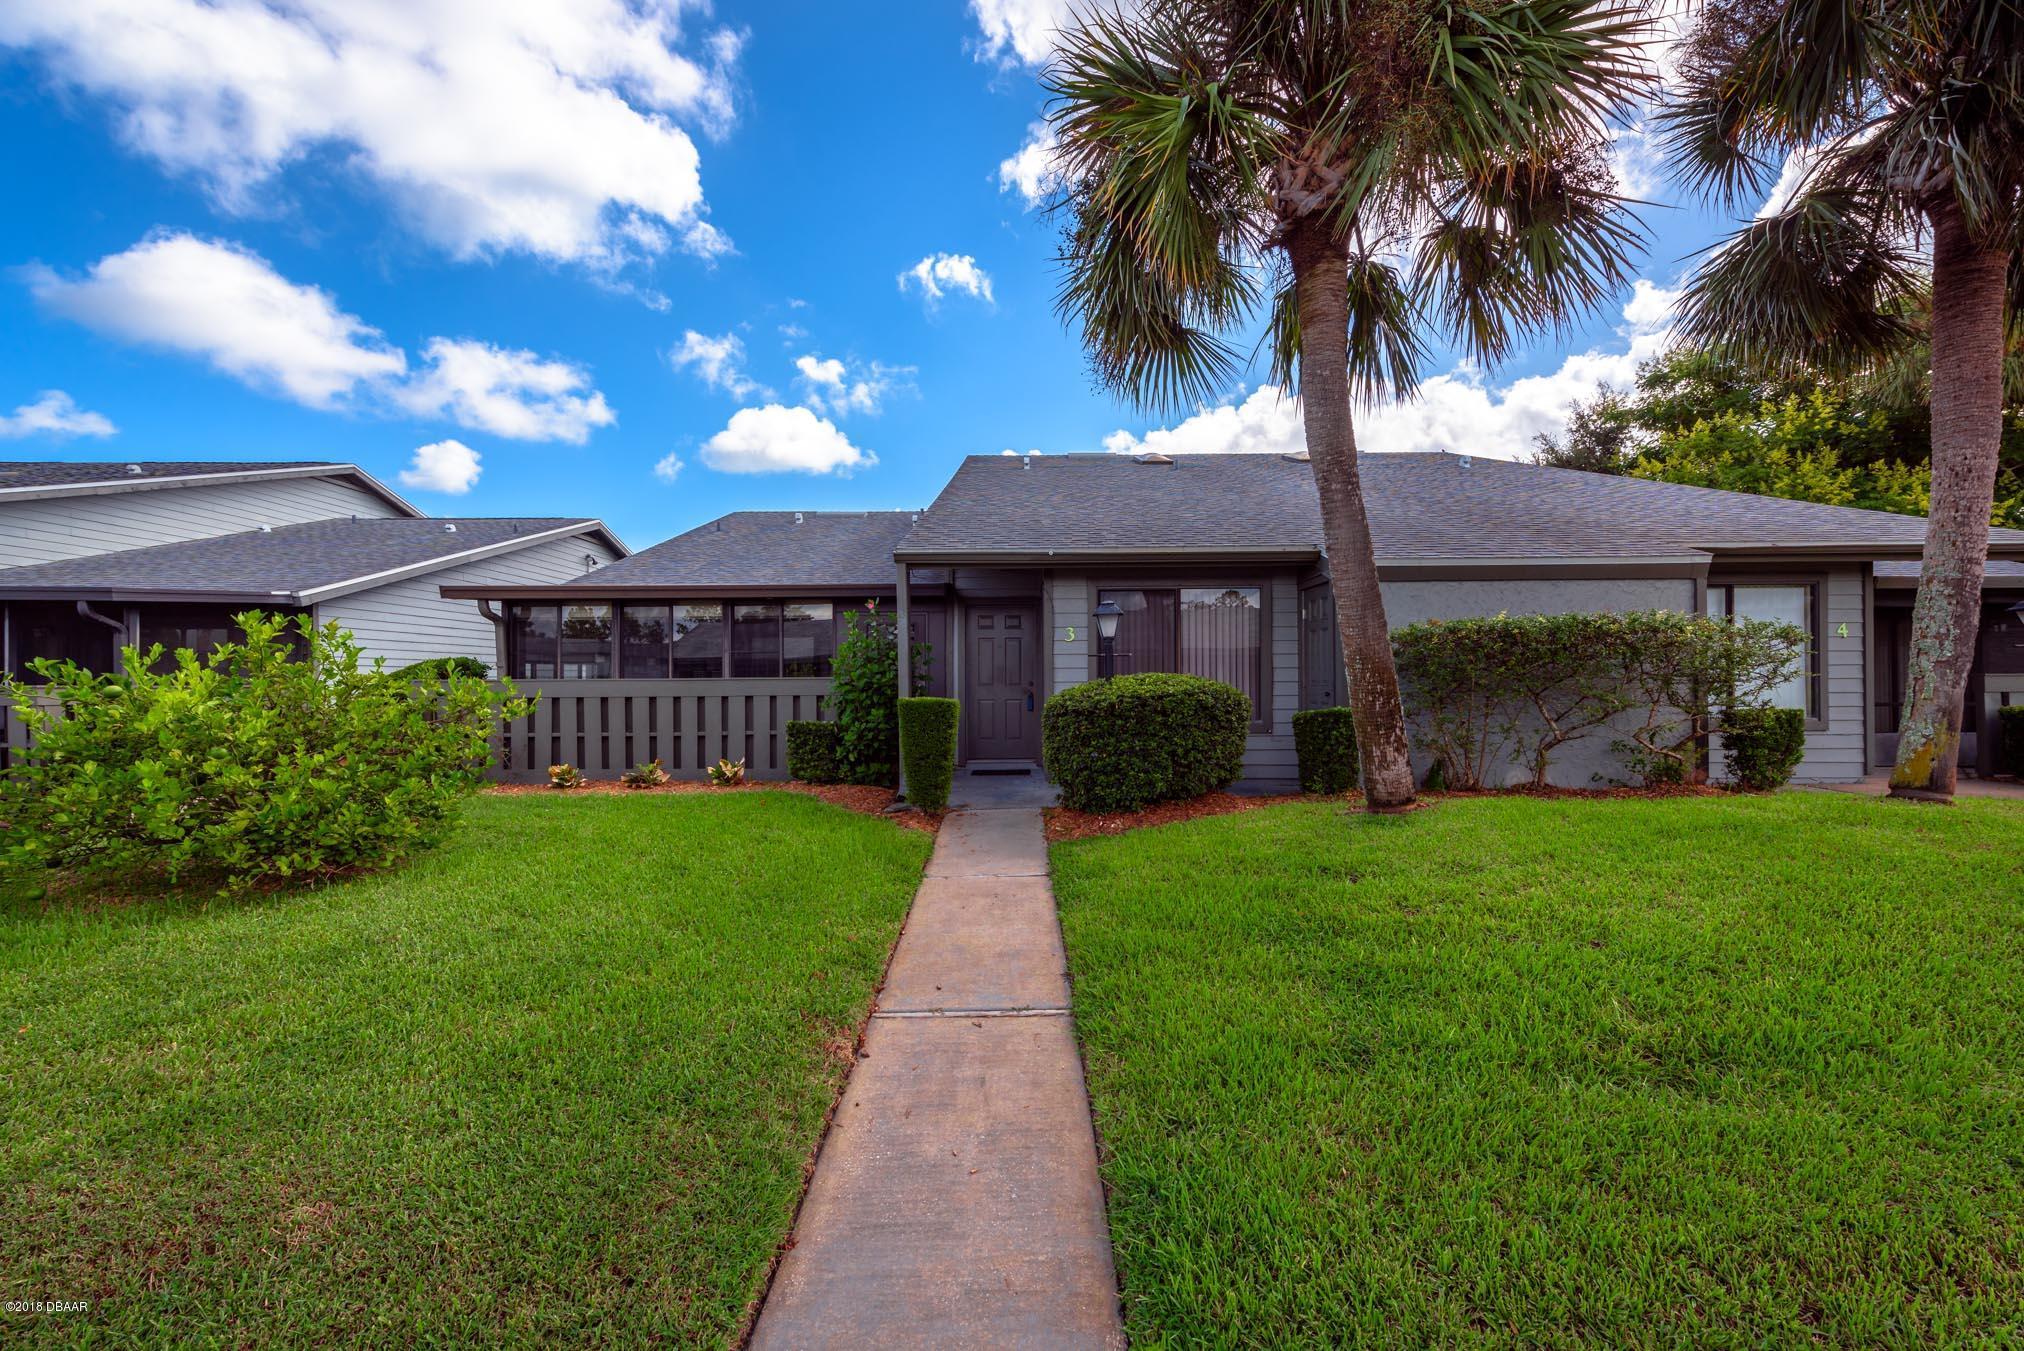 Photo of 190 Limewood Place #3, Ormond Beach, FL 32174